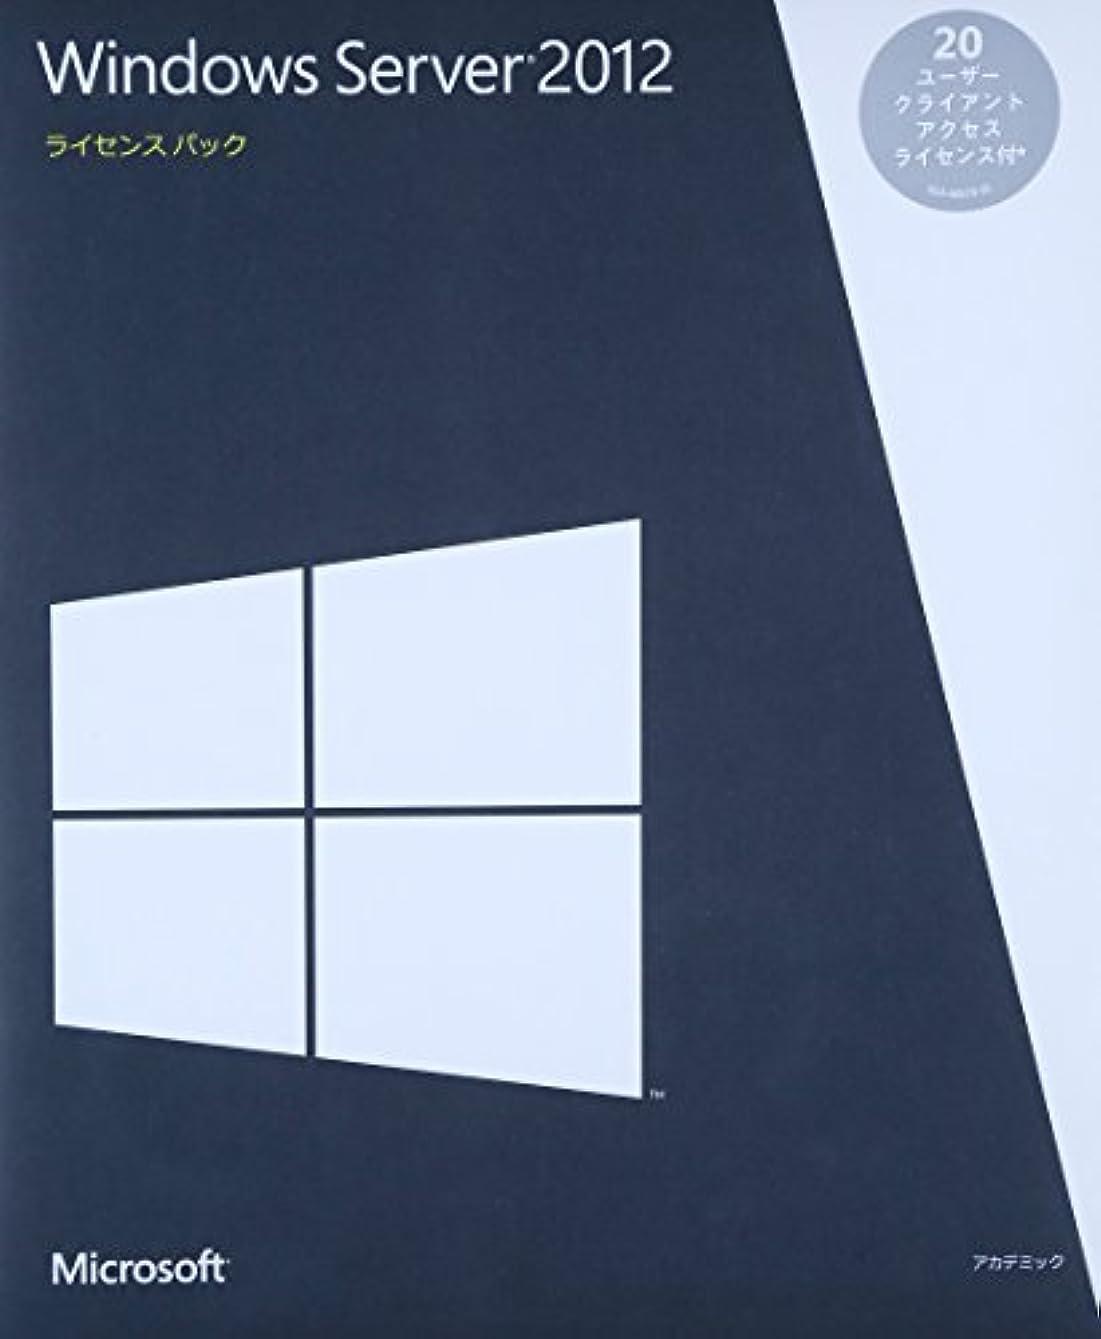 Microsoft アカデミック Windows Server User CAL 2012 MLP|20ライセンス